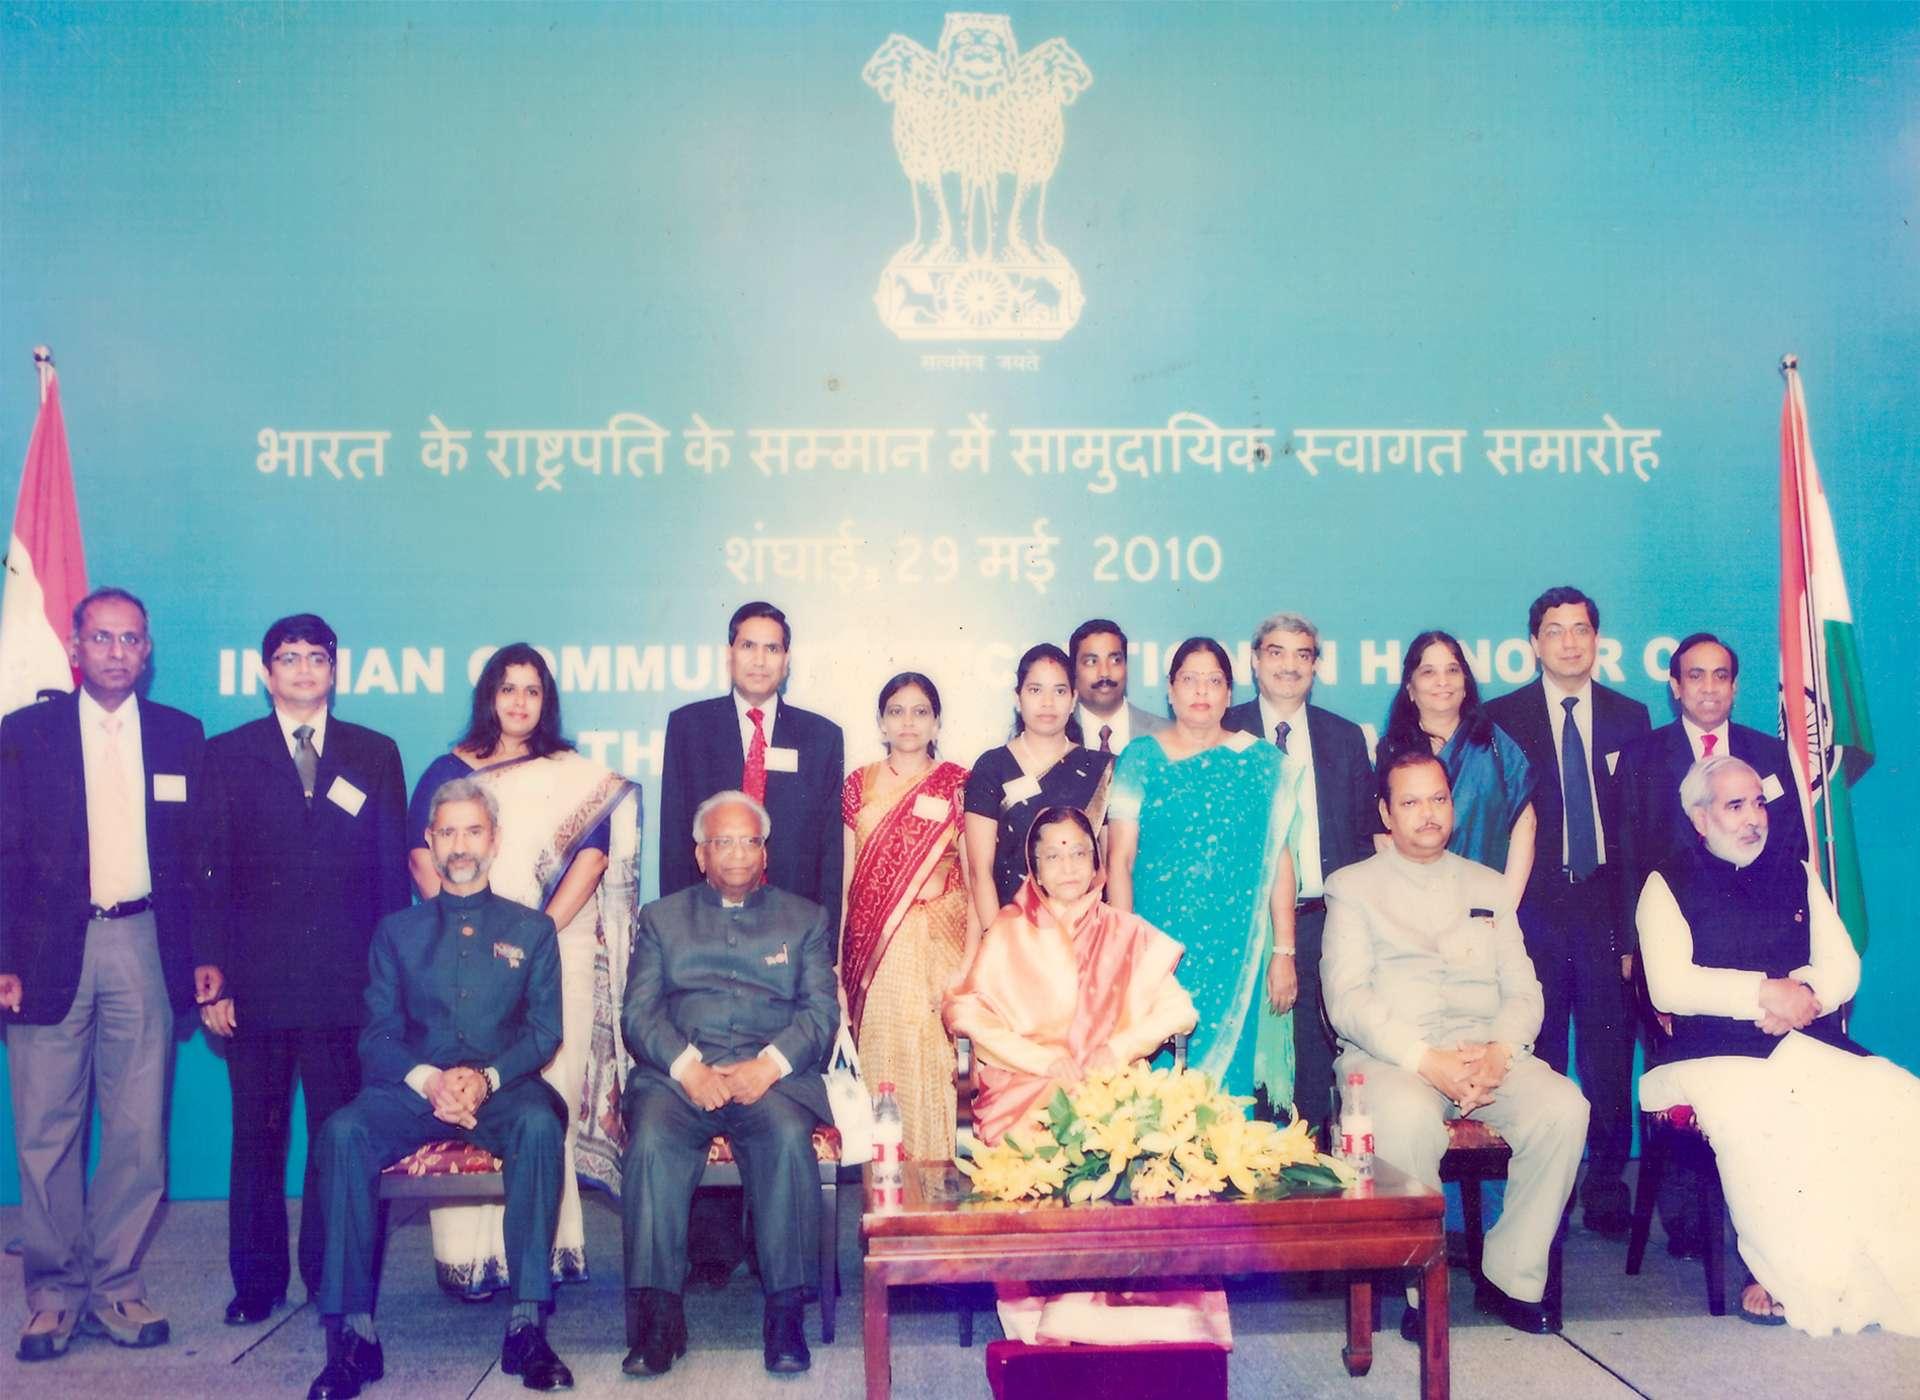 Mr. Rajeshwar Mishra with Honorable President Prathibha Patil